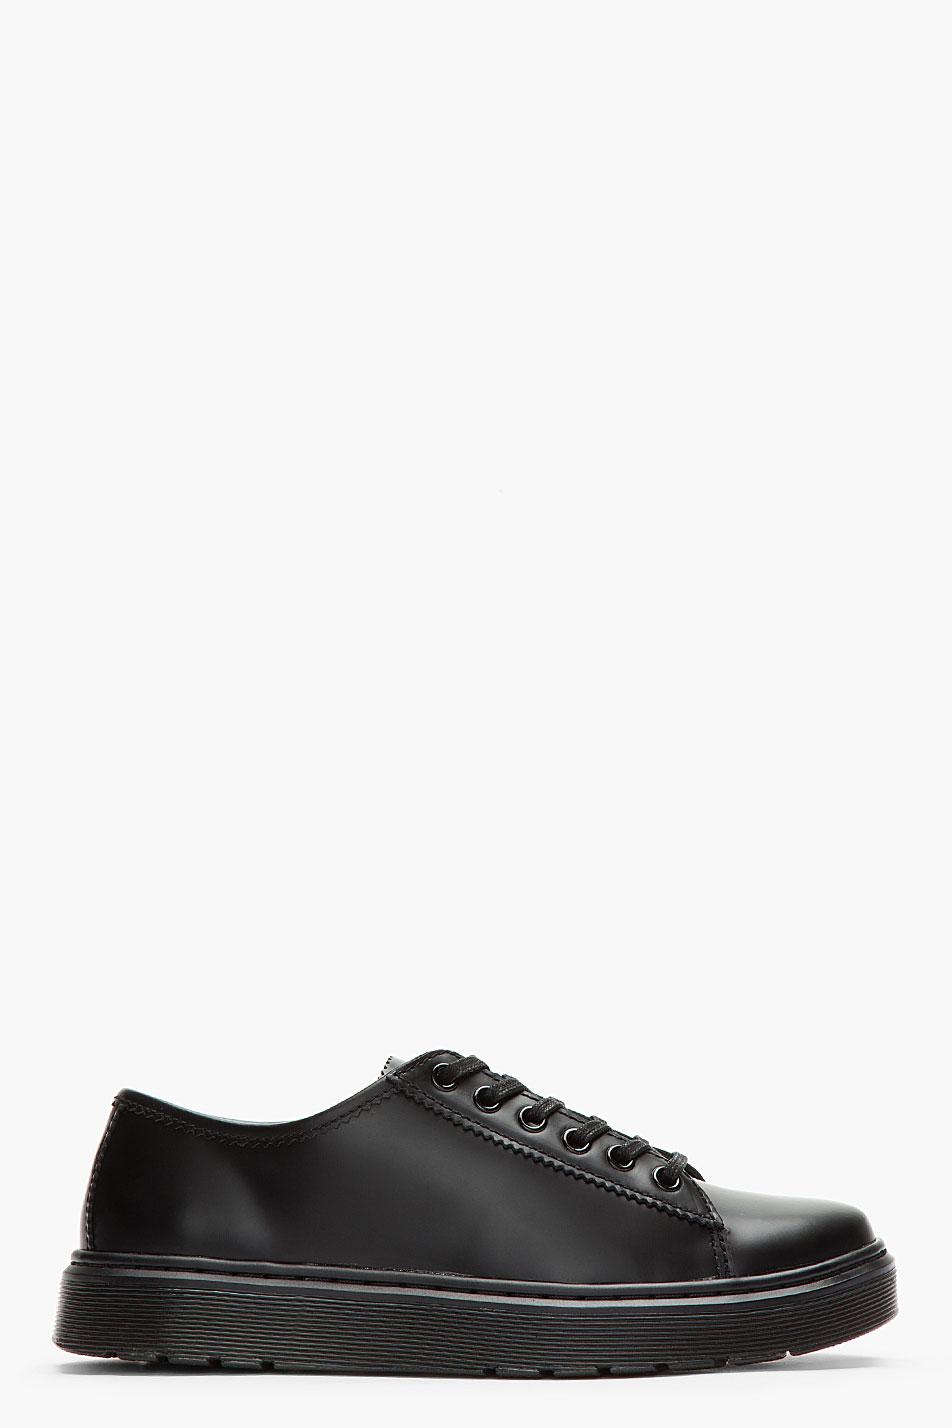 Dr. Martens black sneaker shoe